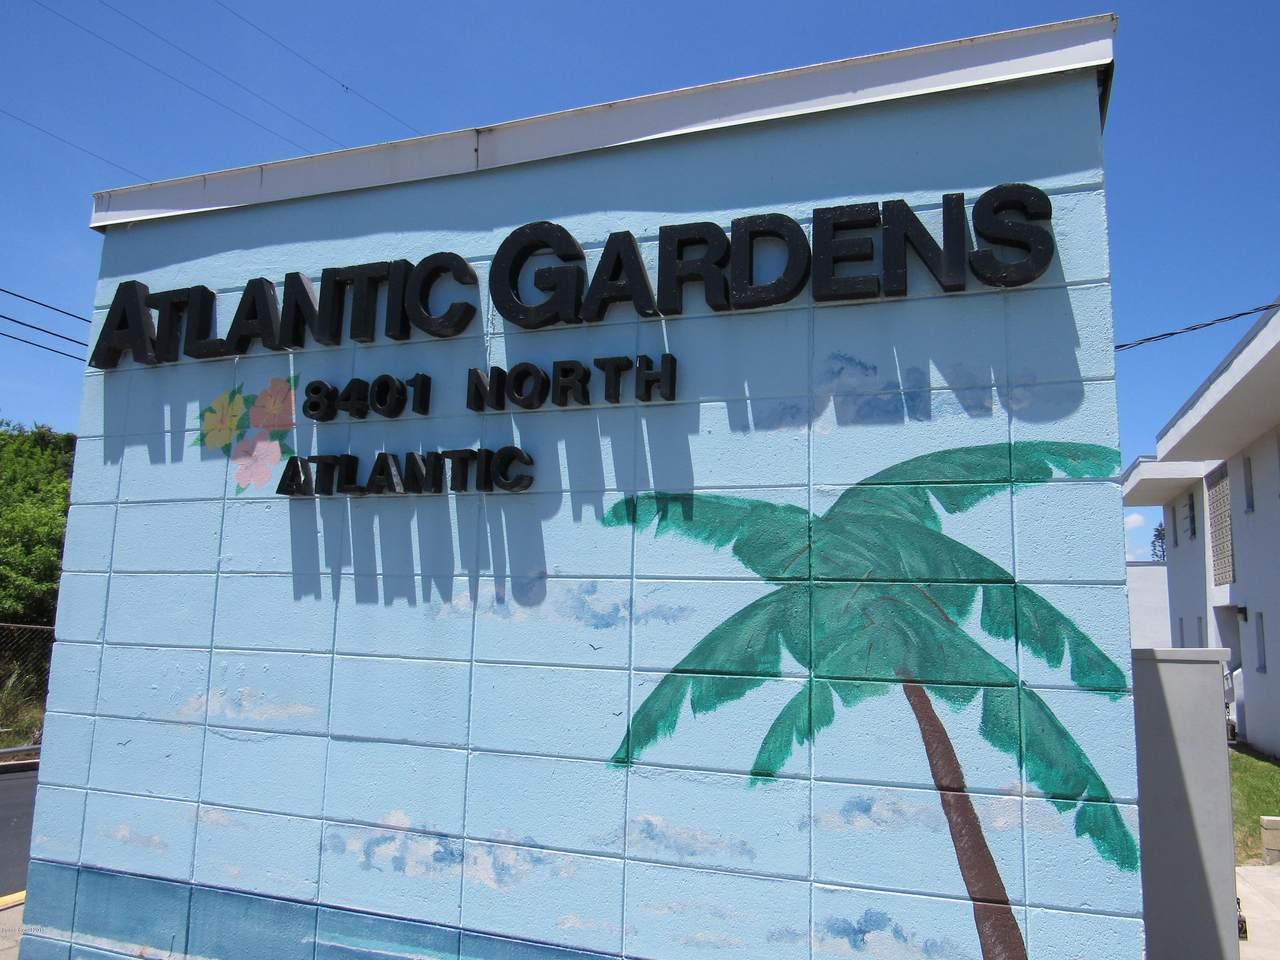 8401 Atlantic Avenue - Photo 1